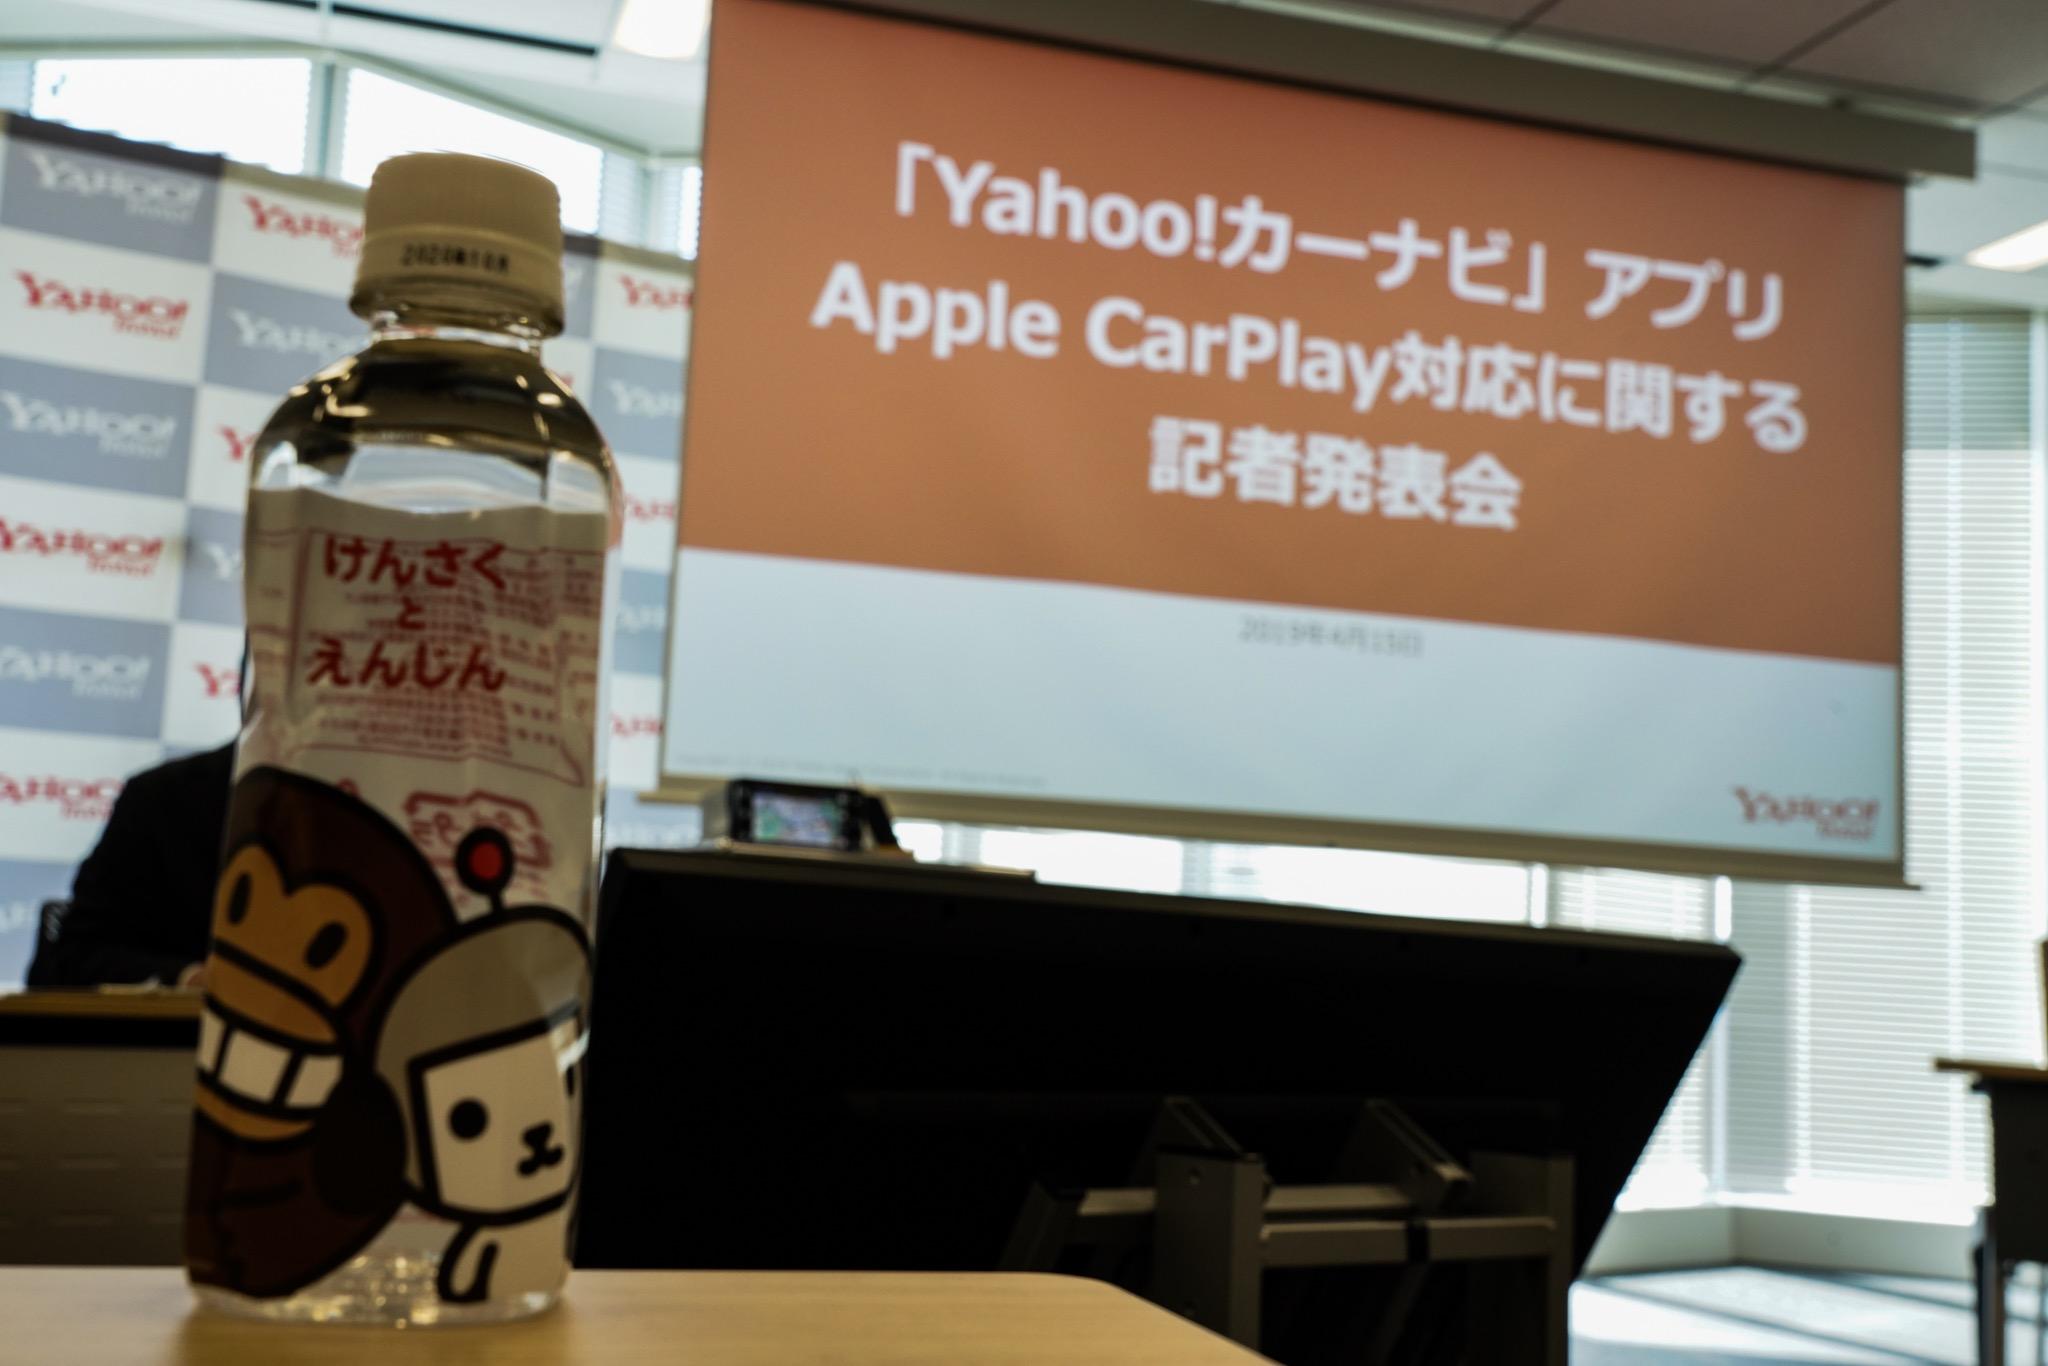 Yahoo!カーナビ Apple CarPlayに対応 記者会見